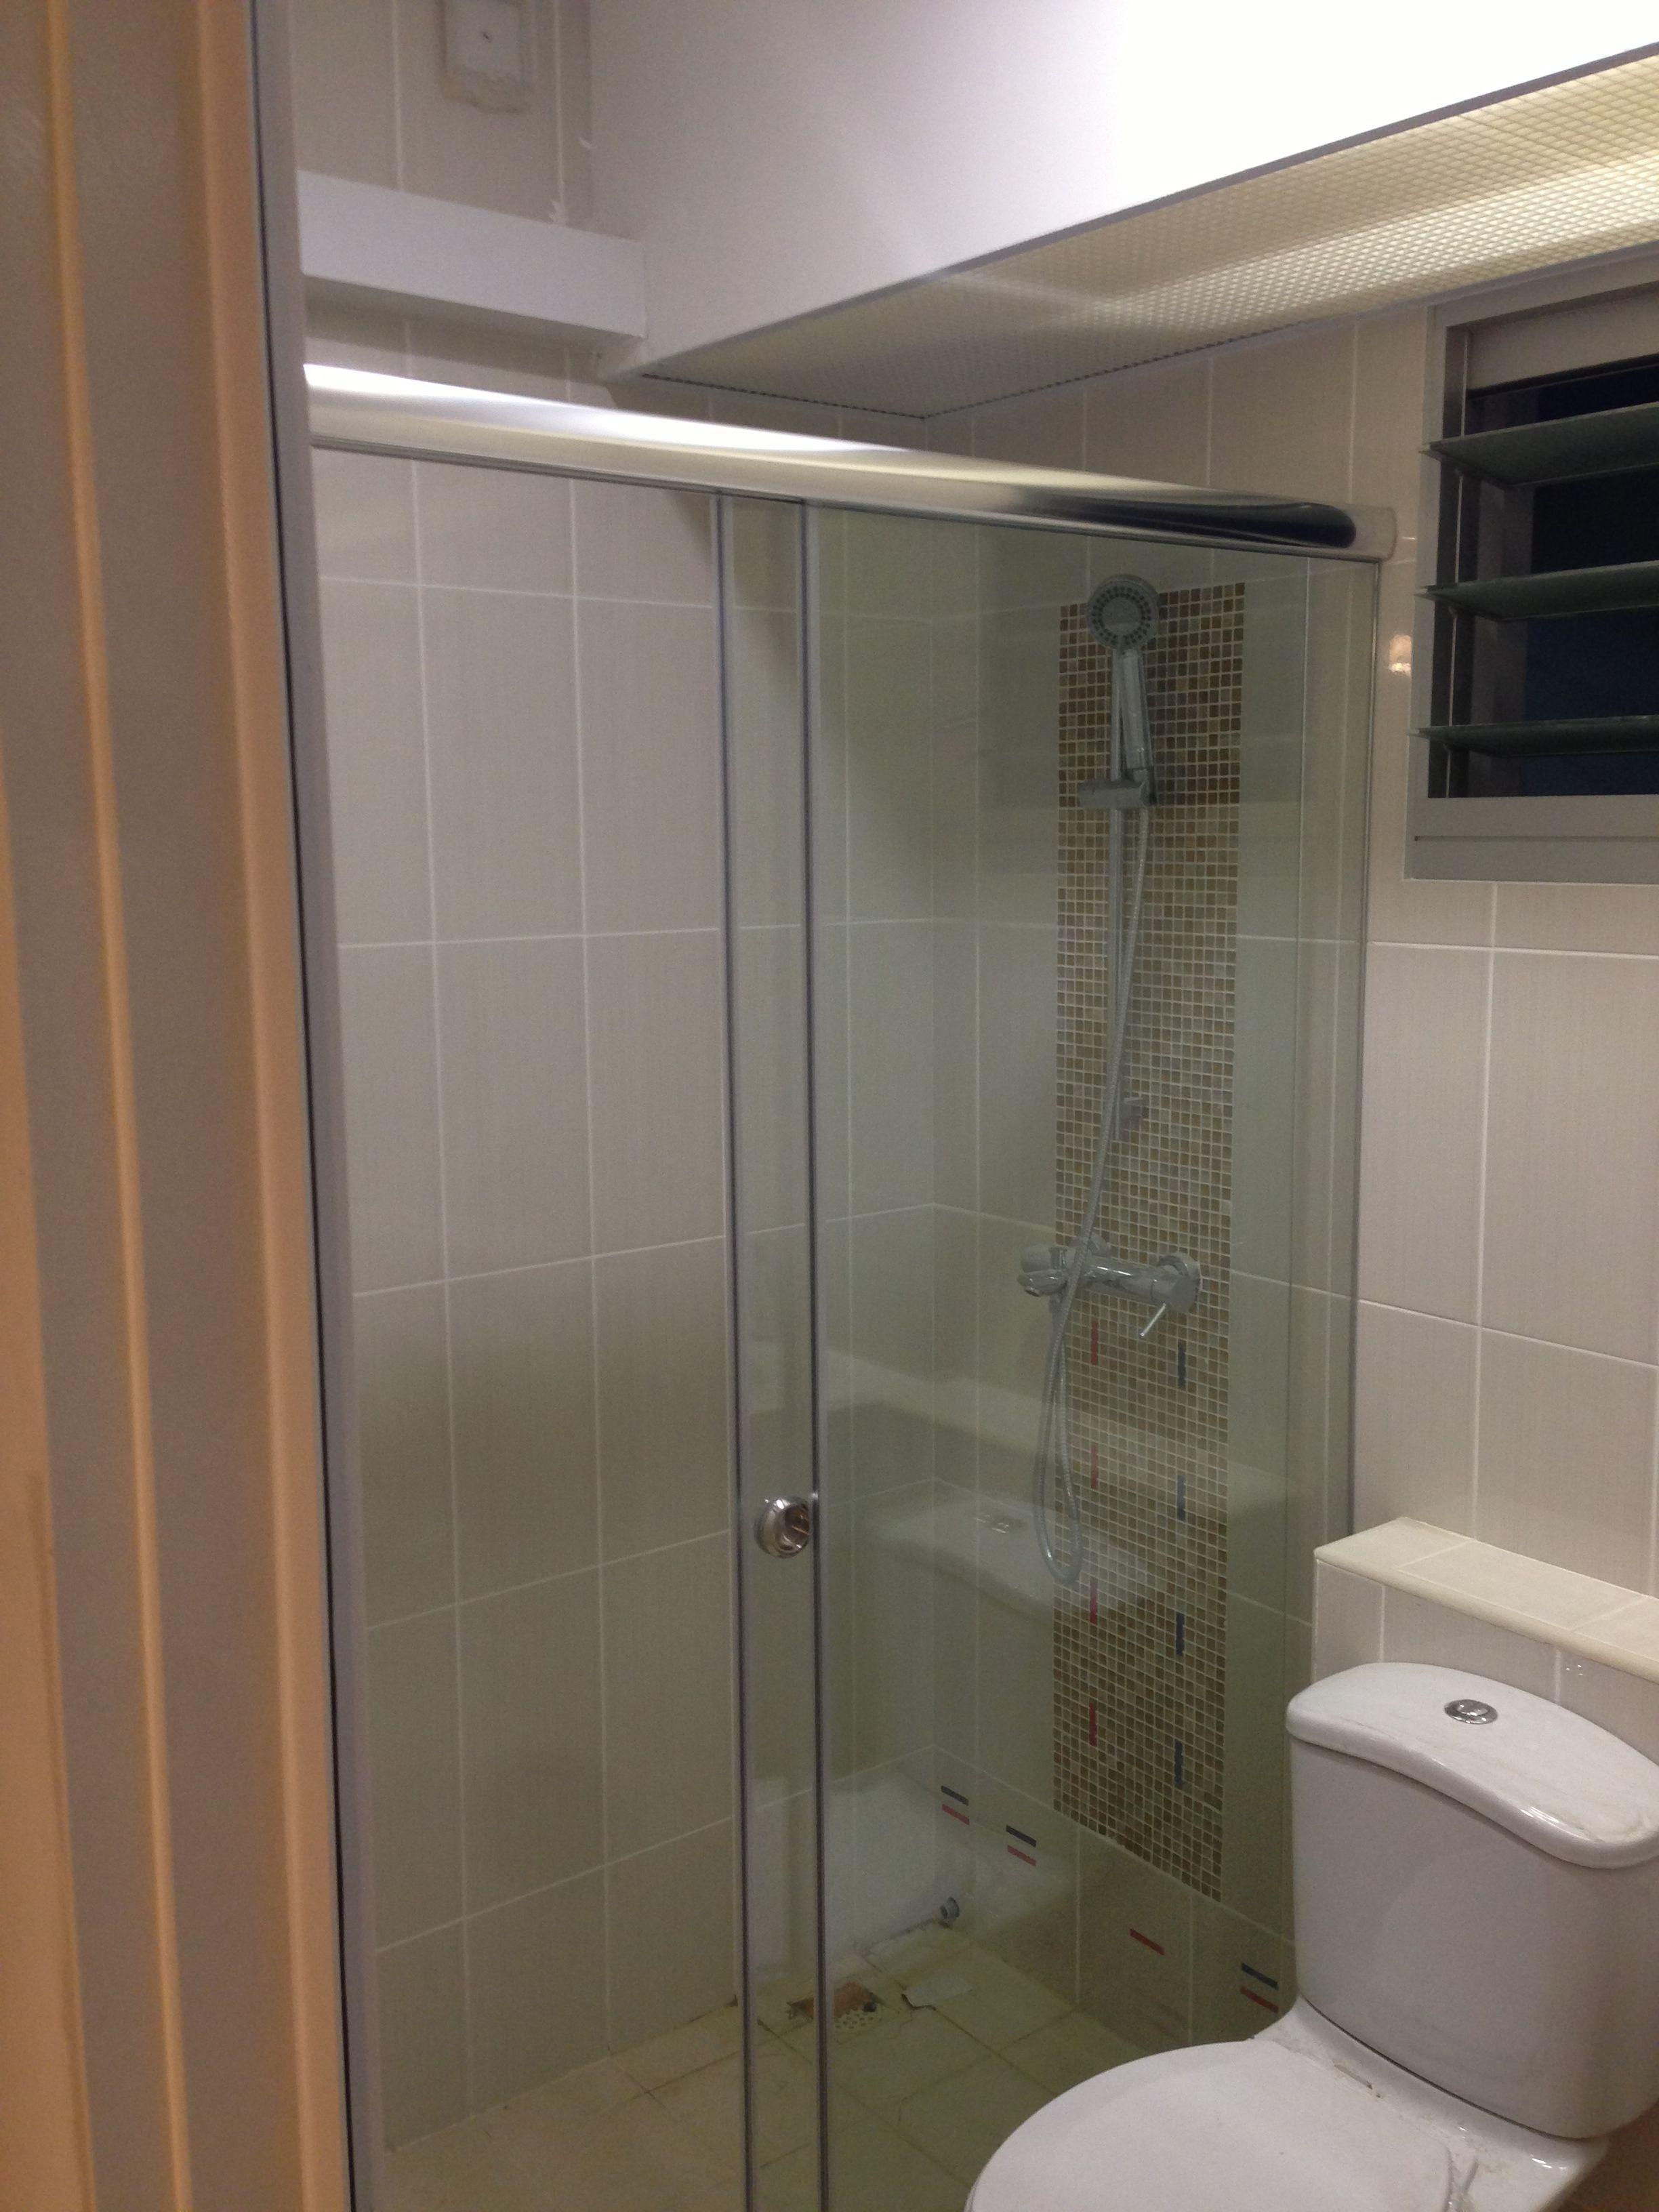 Sliding Shower Screen Intradesign Bathroom Shower Enclosures Rustic Bathroom Shelves Shower Enclosure